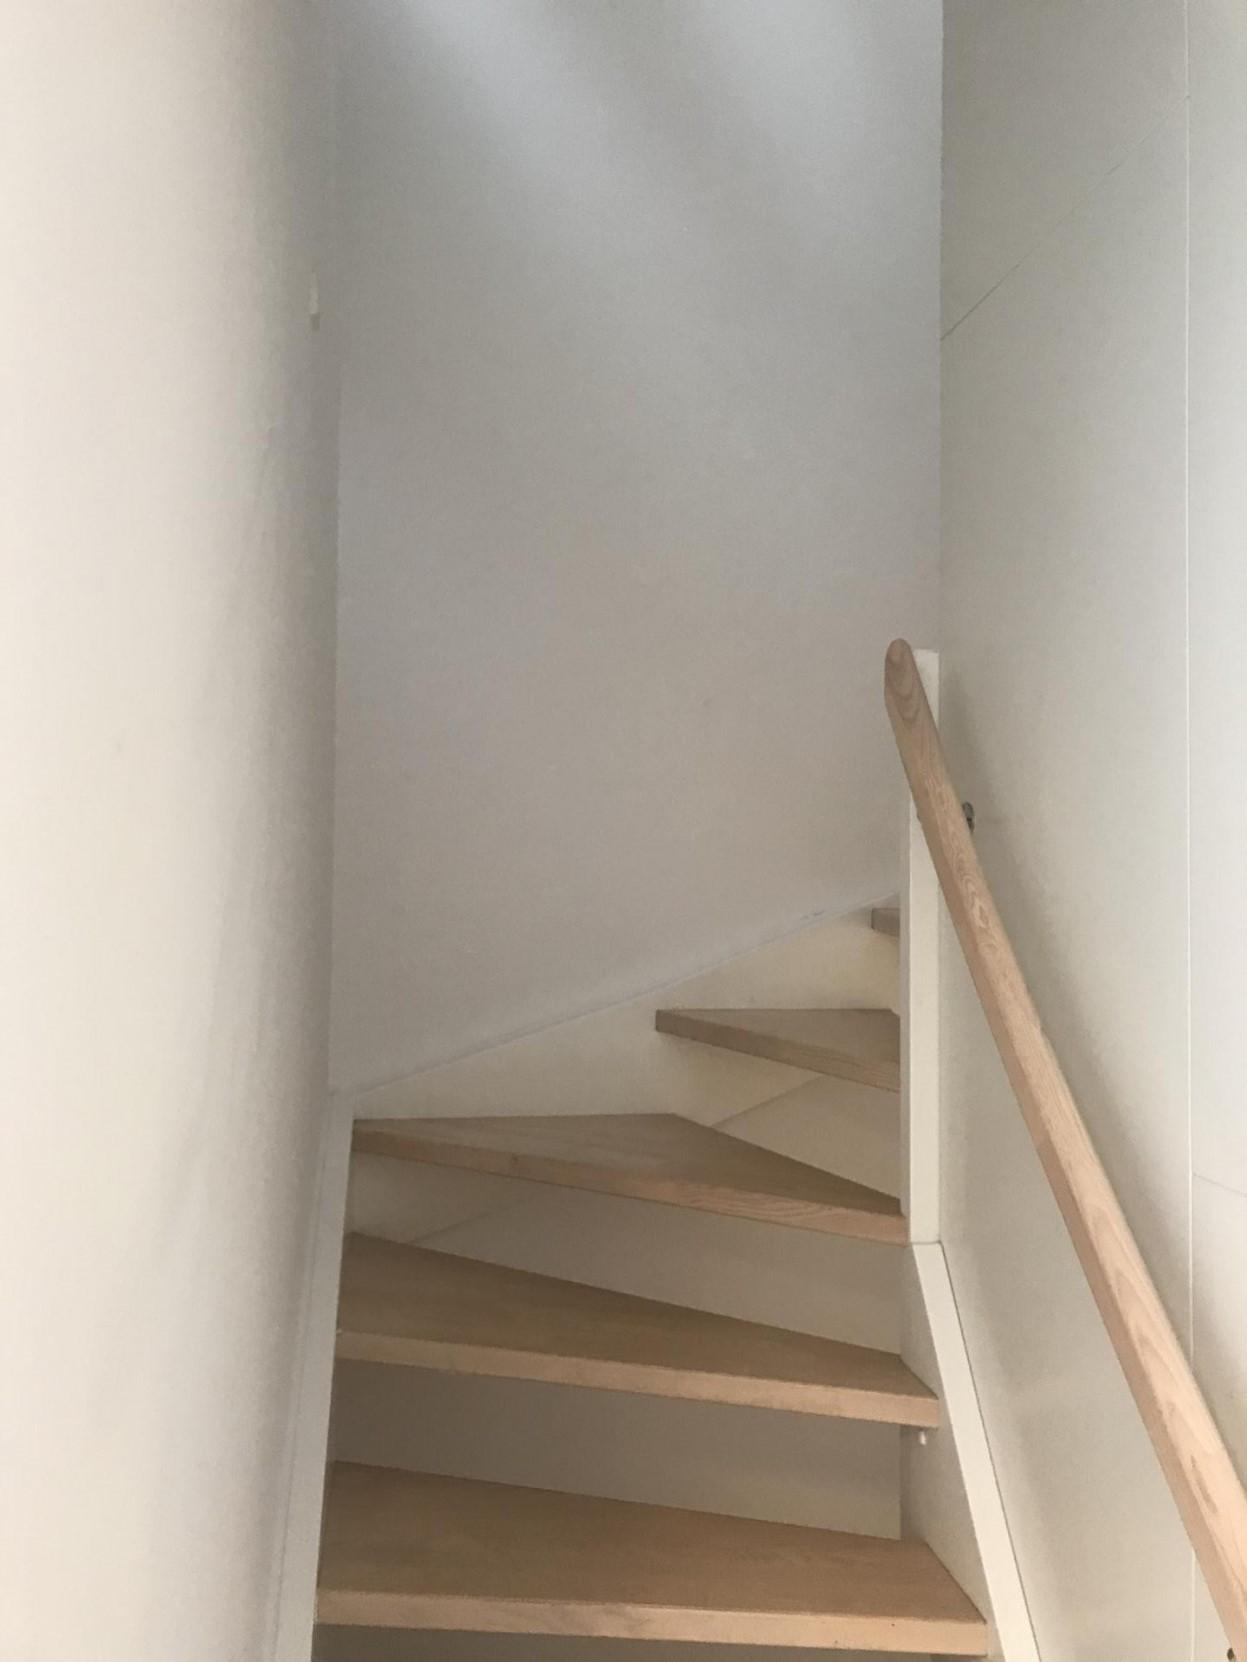 Stairs at Ben Webster Vej Apartments, Sydhavnen, Copenhagen